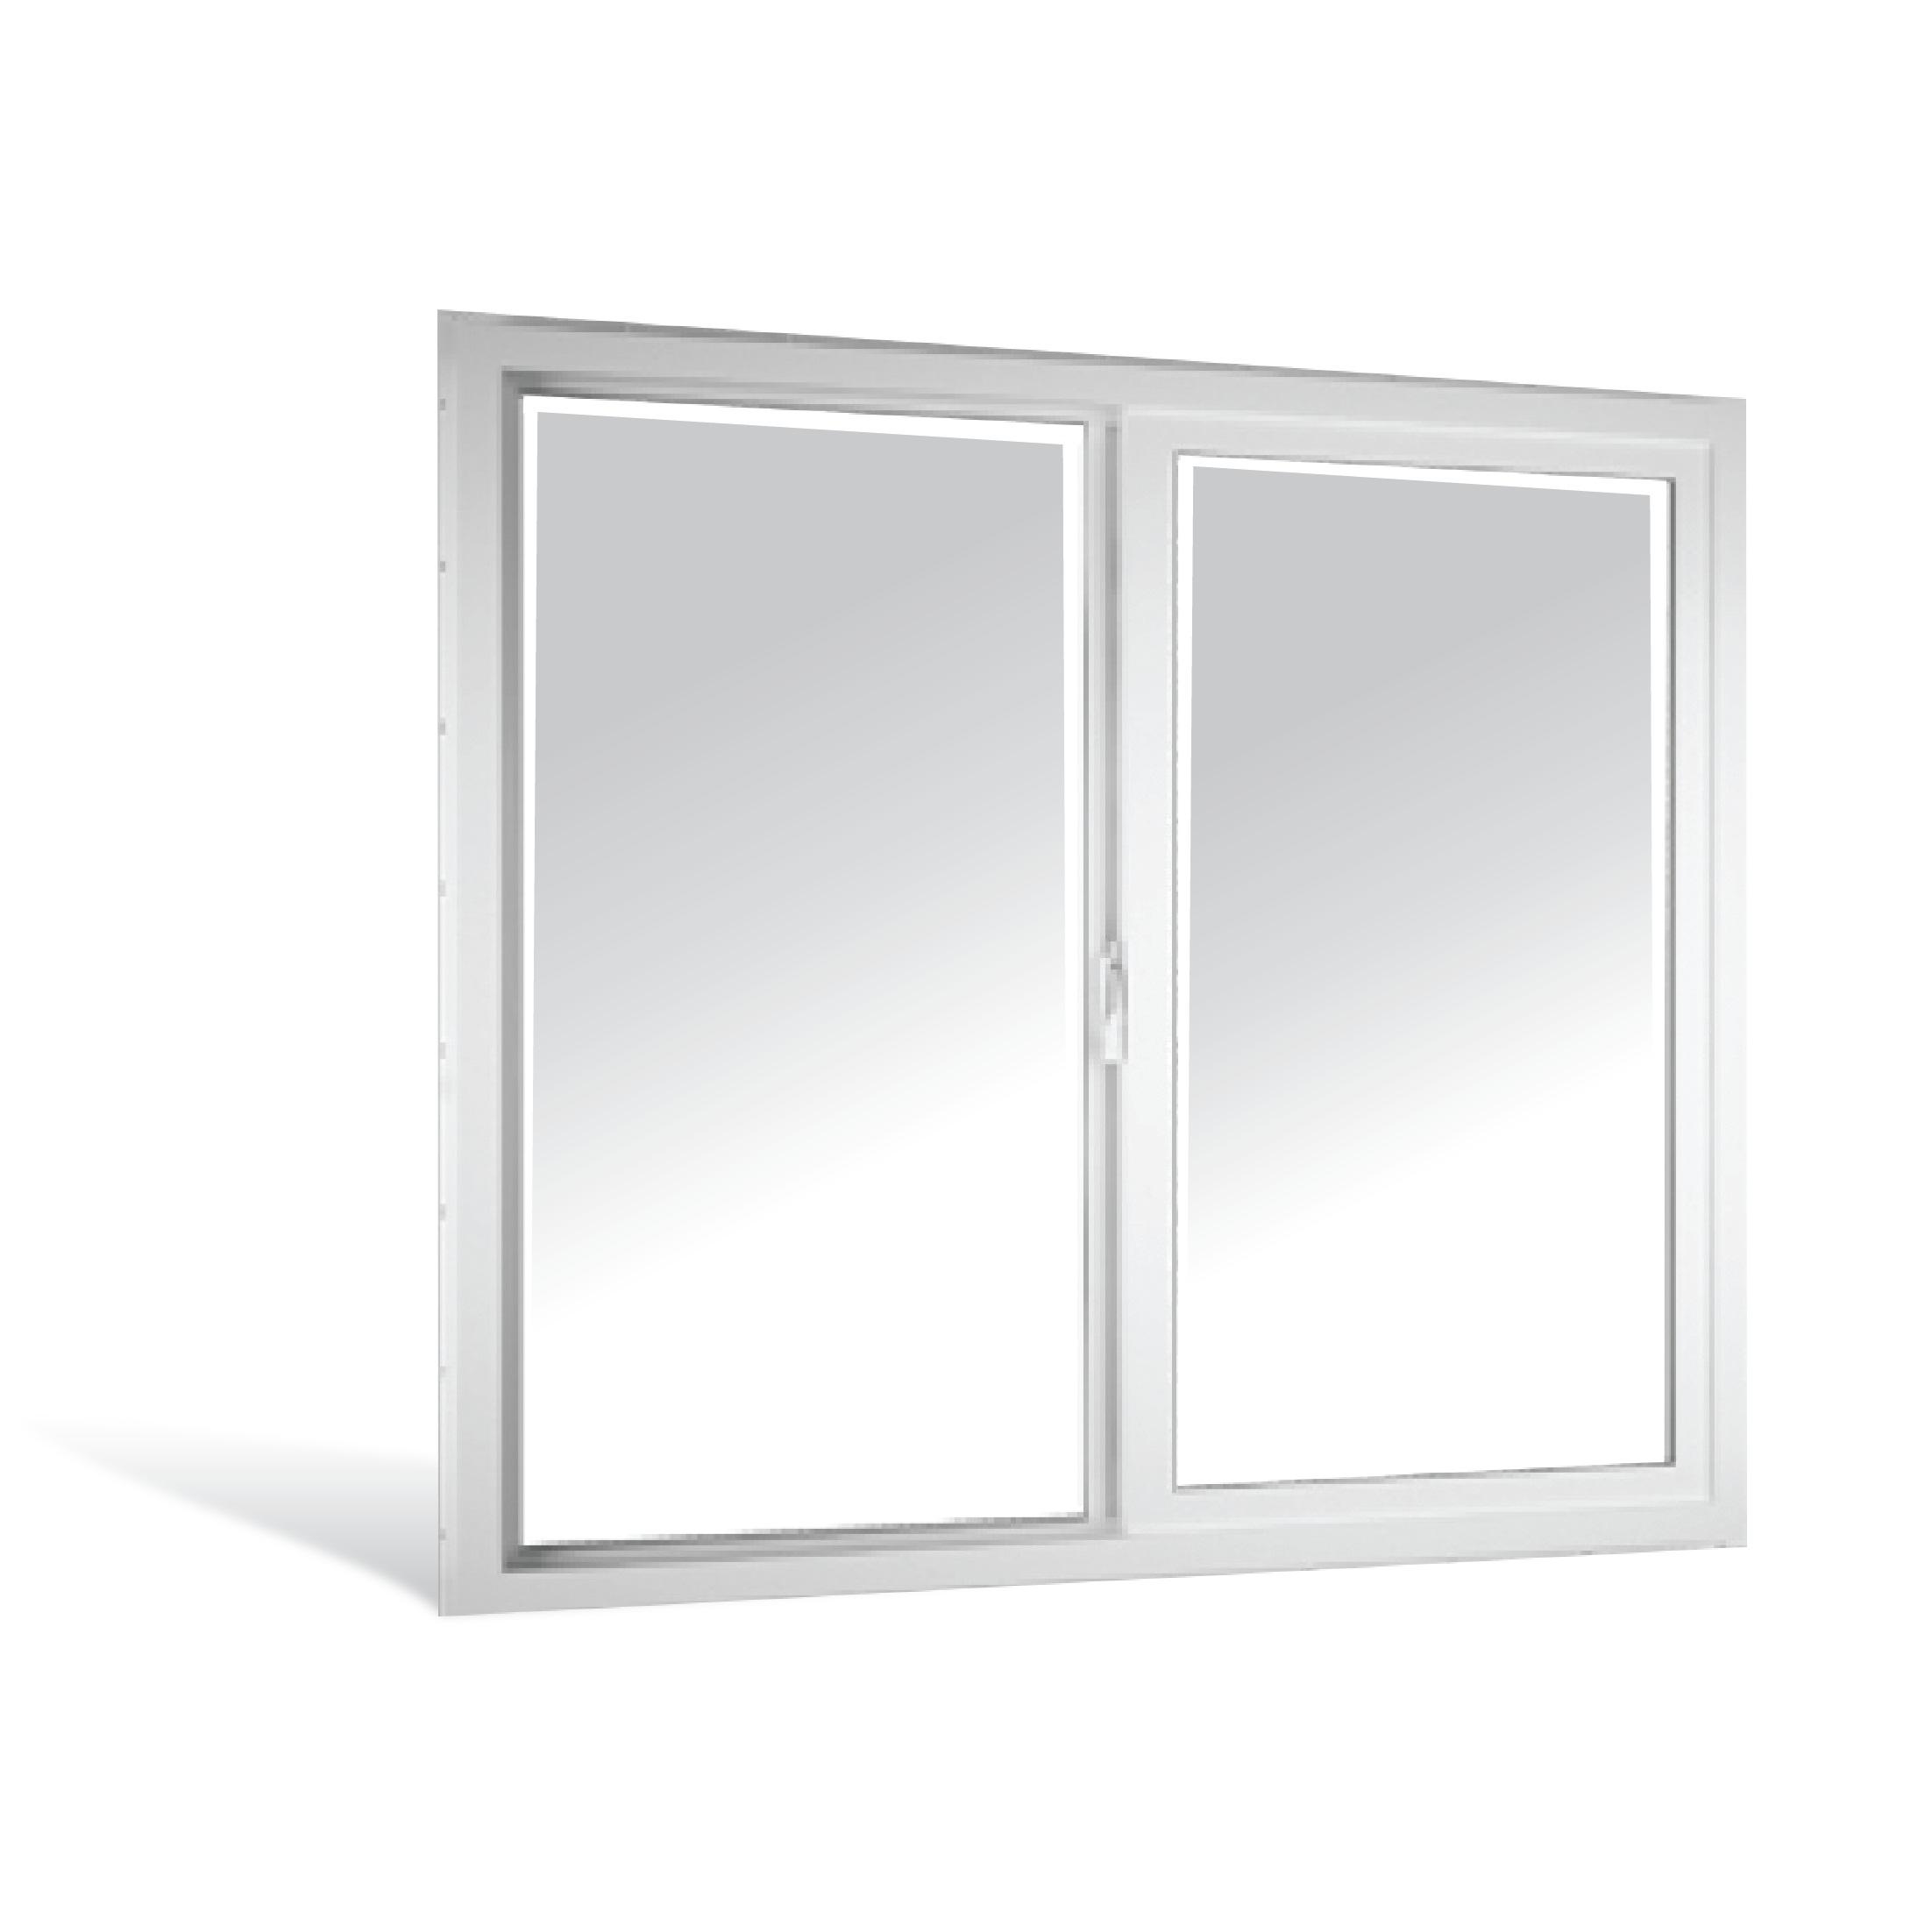 Ventana sencilla de 0.9m x 1.2m de PVC color blanco